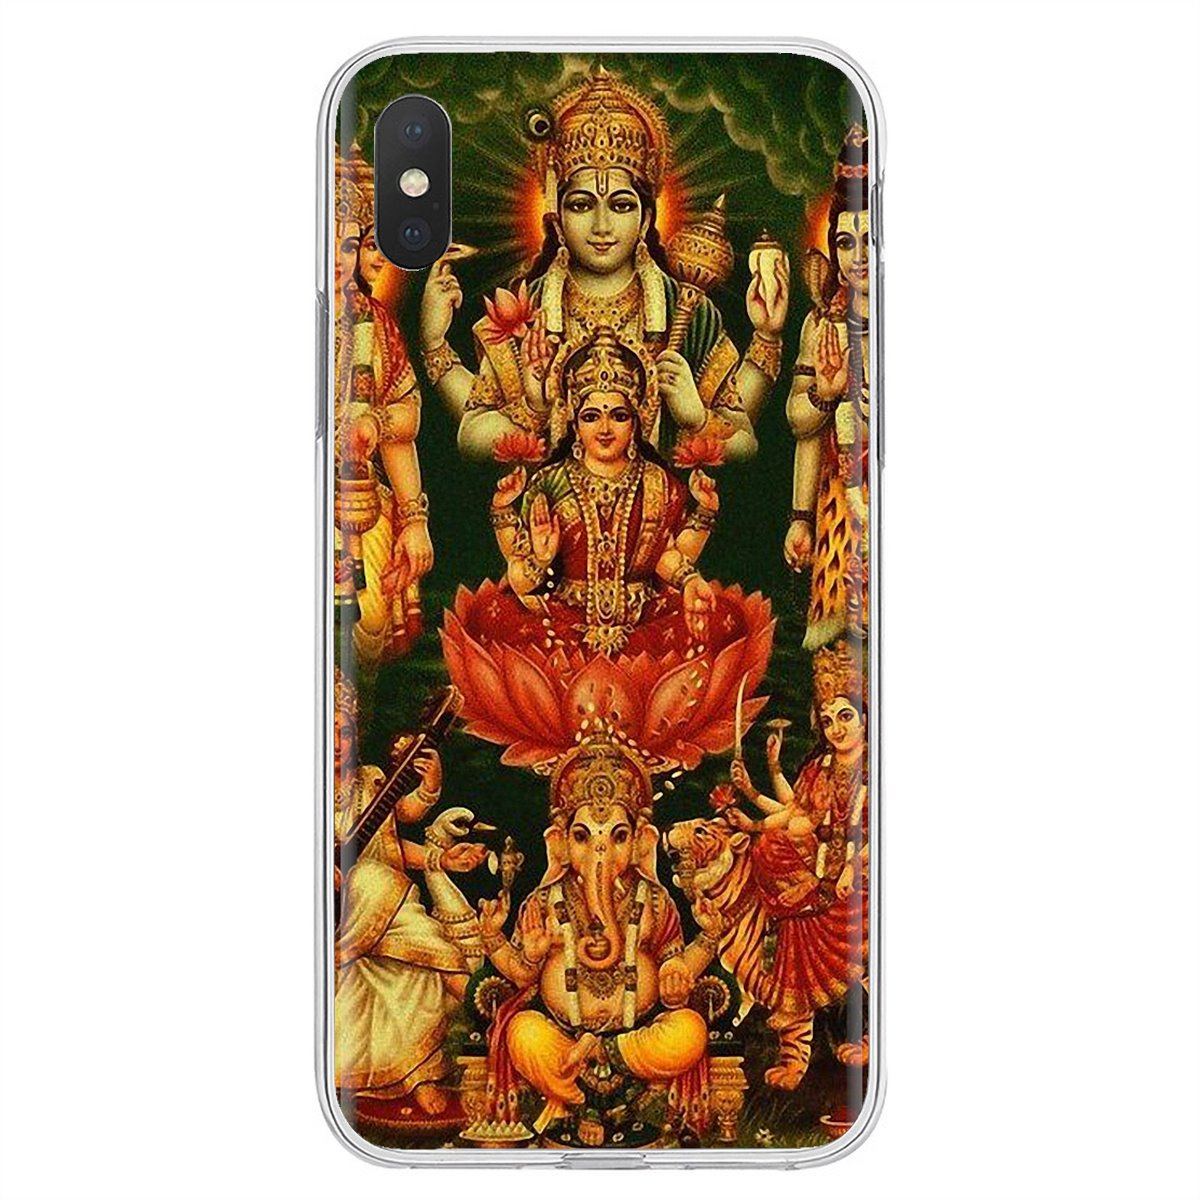 Индии индийский Бог Шива езда нанди силиконовый чехол Обложка для samsung Galaxy J1 J2 J3 J4 J5 J6 J7 J8 плюс 2018 Prime 2015 2016 2017